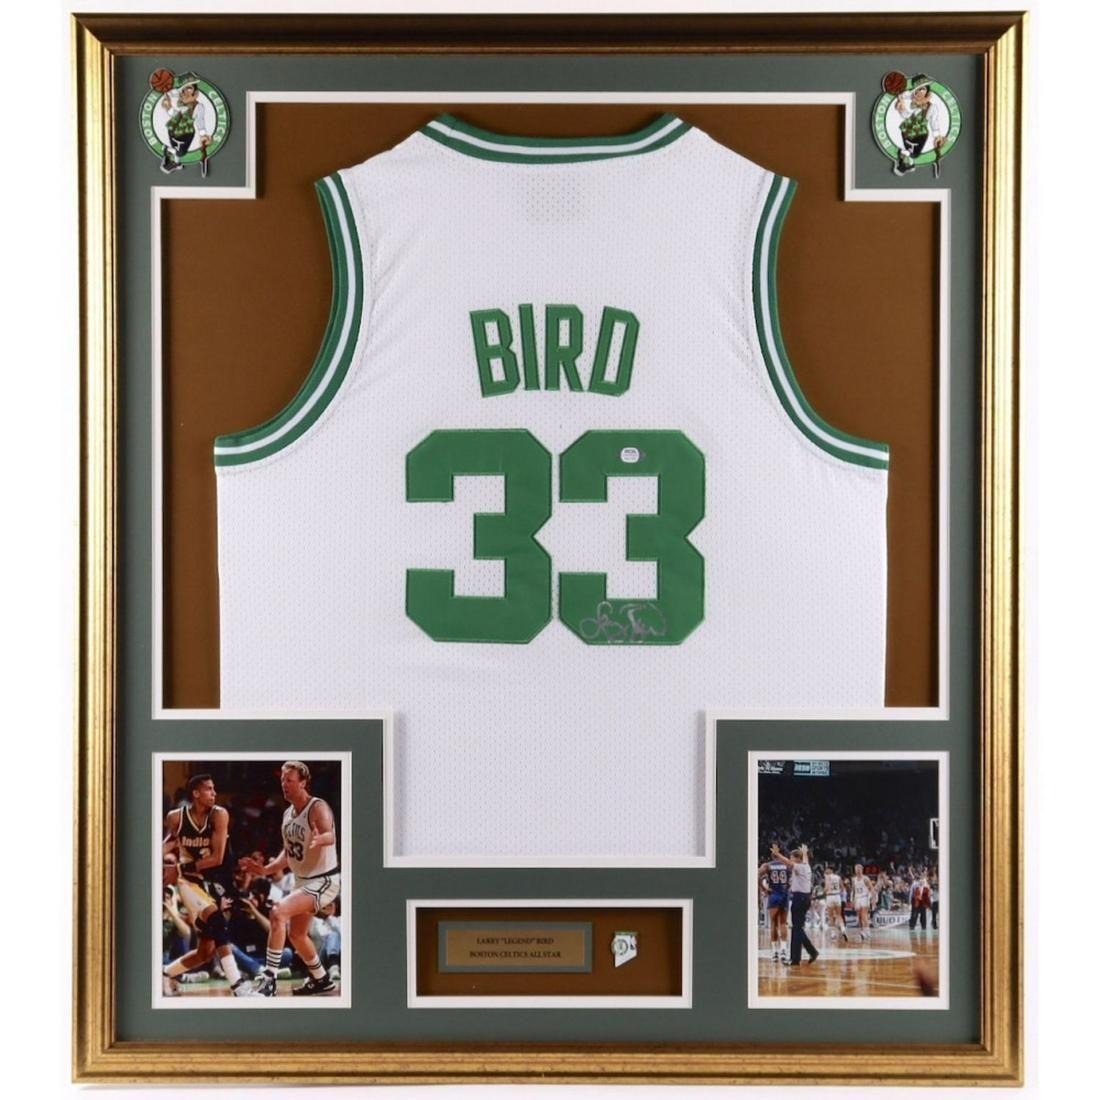 Larry Bird Signed 33x37 Custom Framed Jersey Display